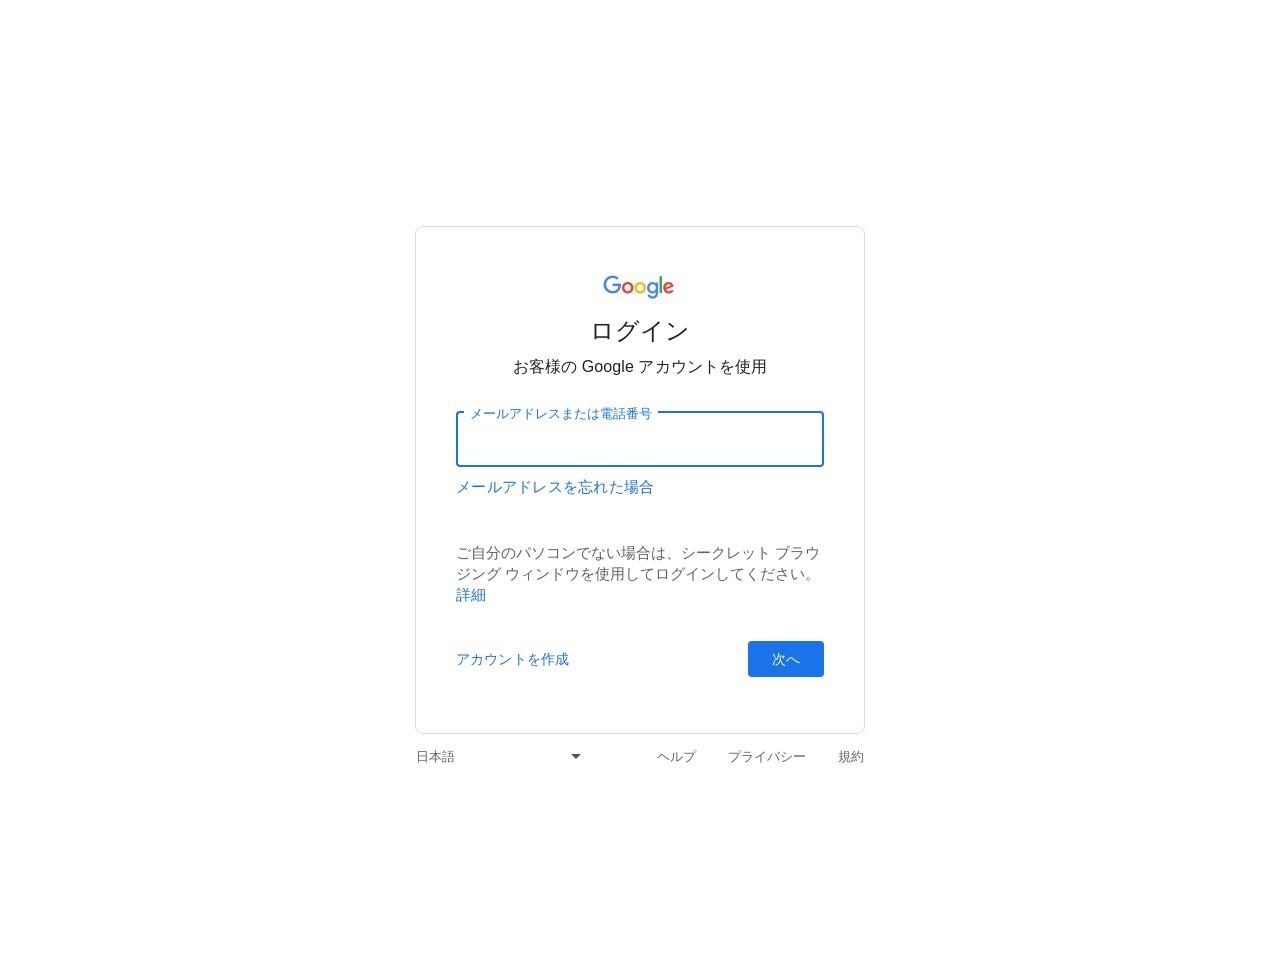 about?w=image Nail Arts Screen Google